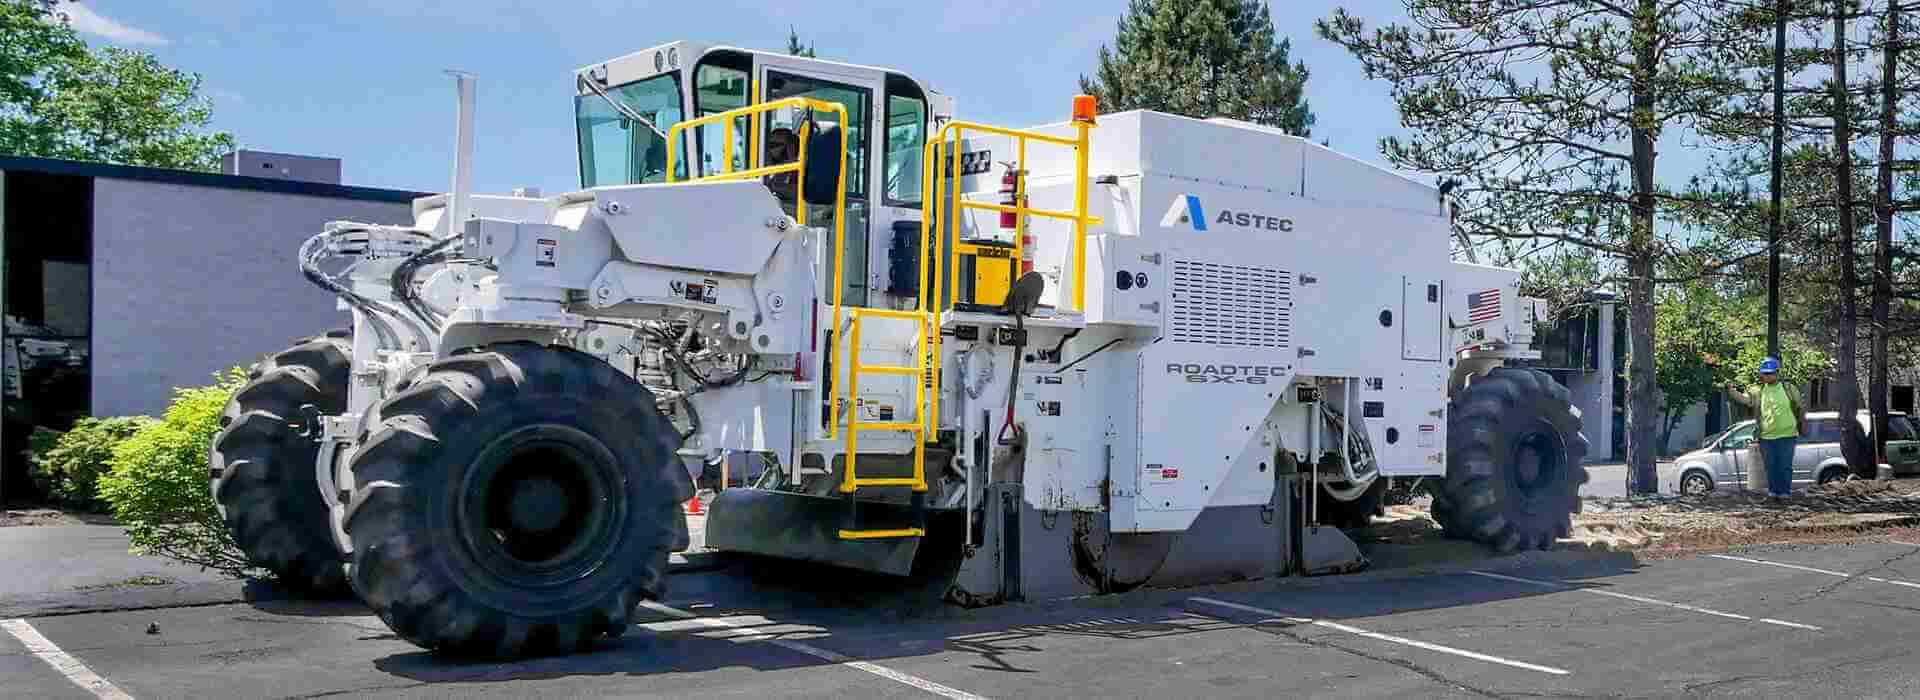 Roadtec SX-6 Soil Stabilizer/Reclaimer reclaiming an asphalt surface